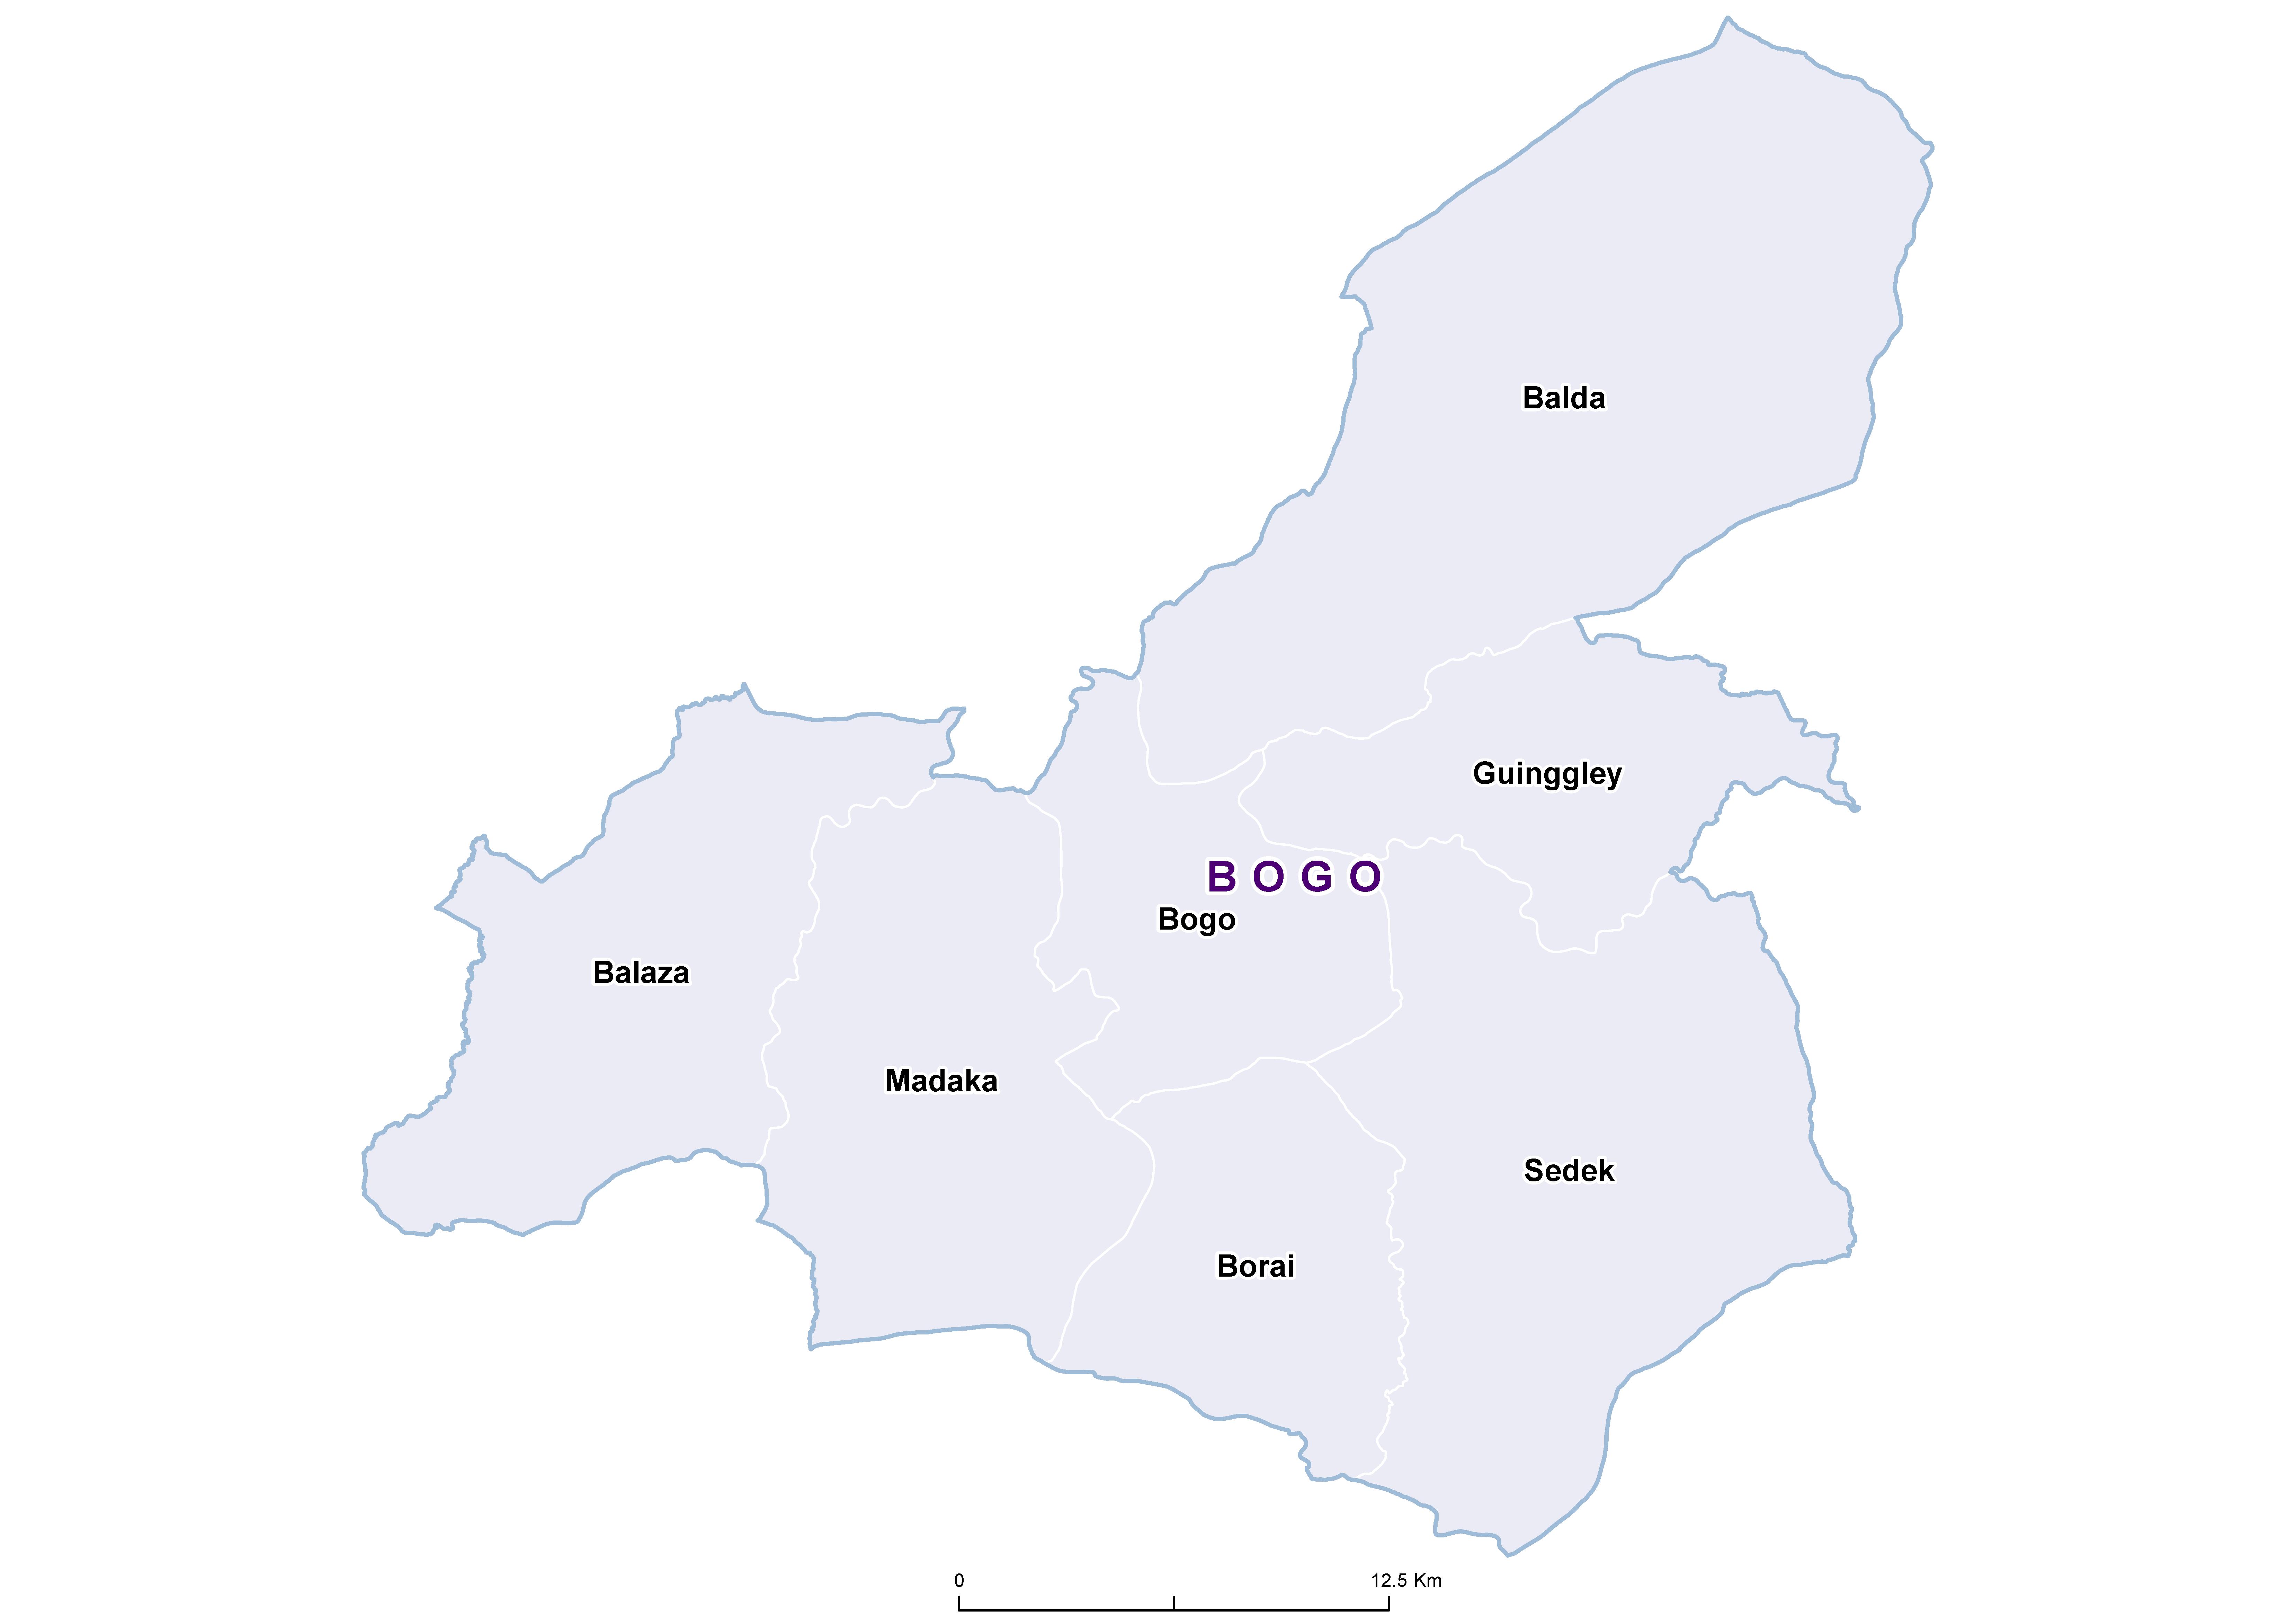 Bogo STH 20180001